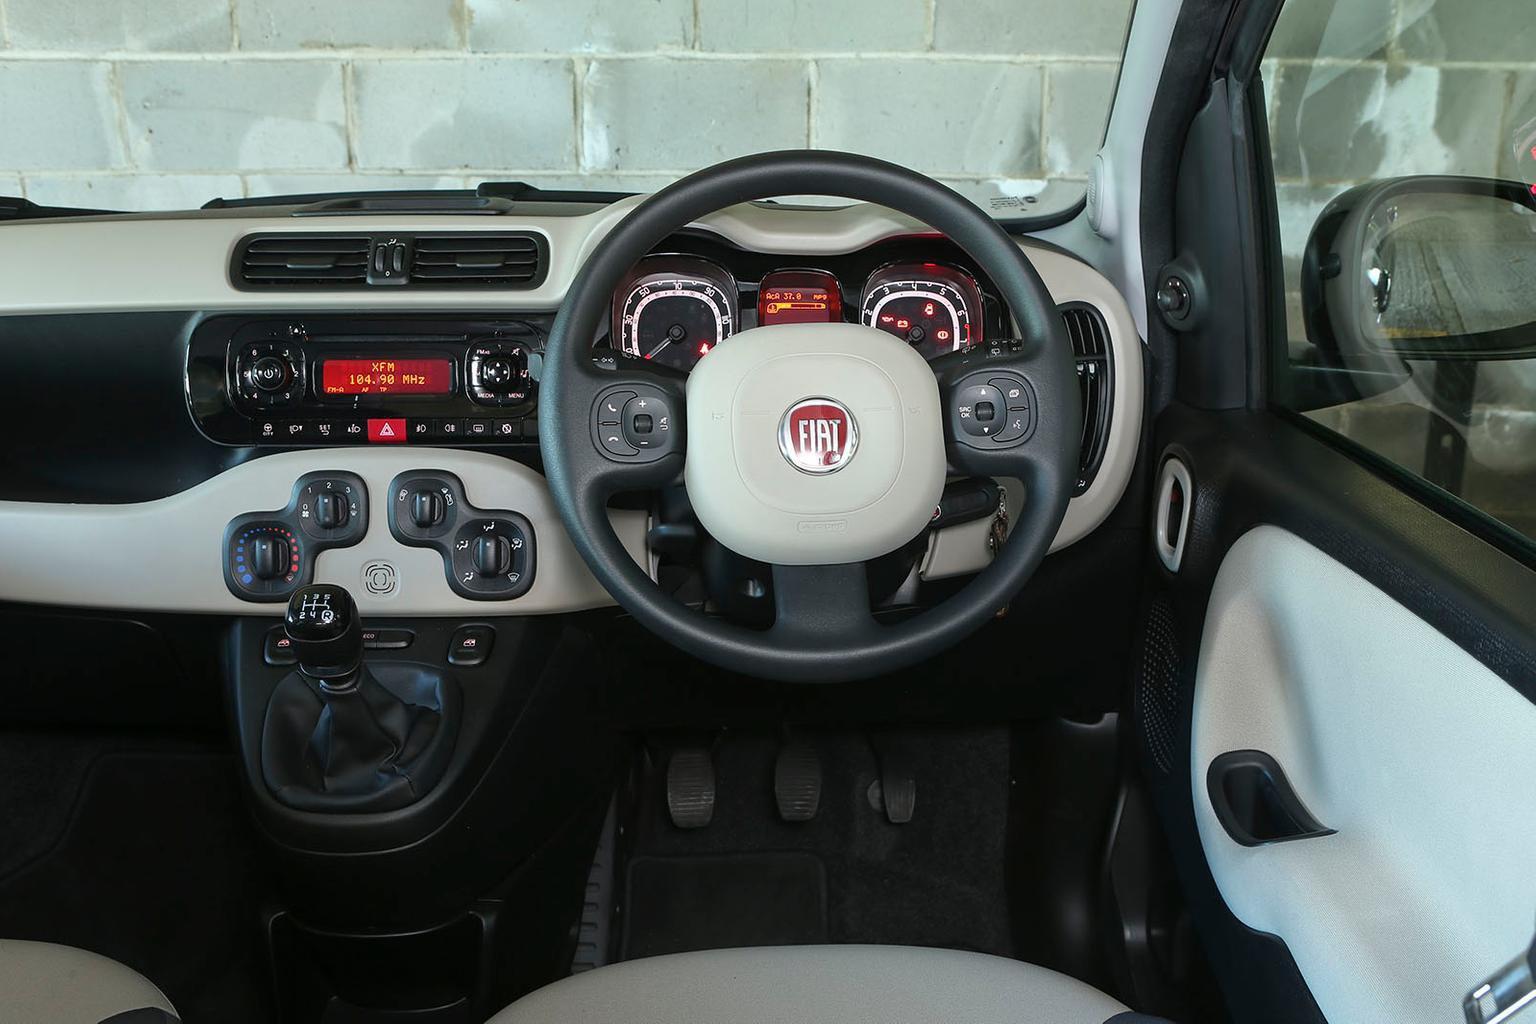 Fiat Panda 1.2 Pop - interior